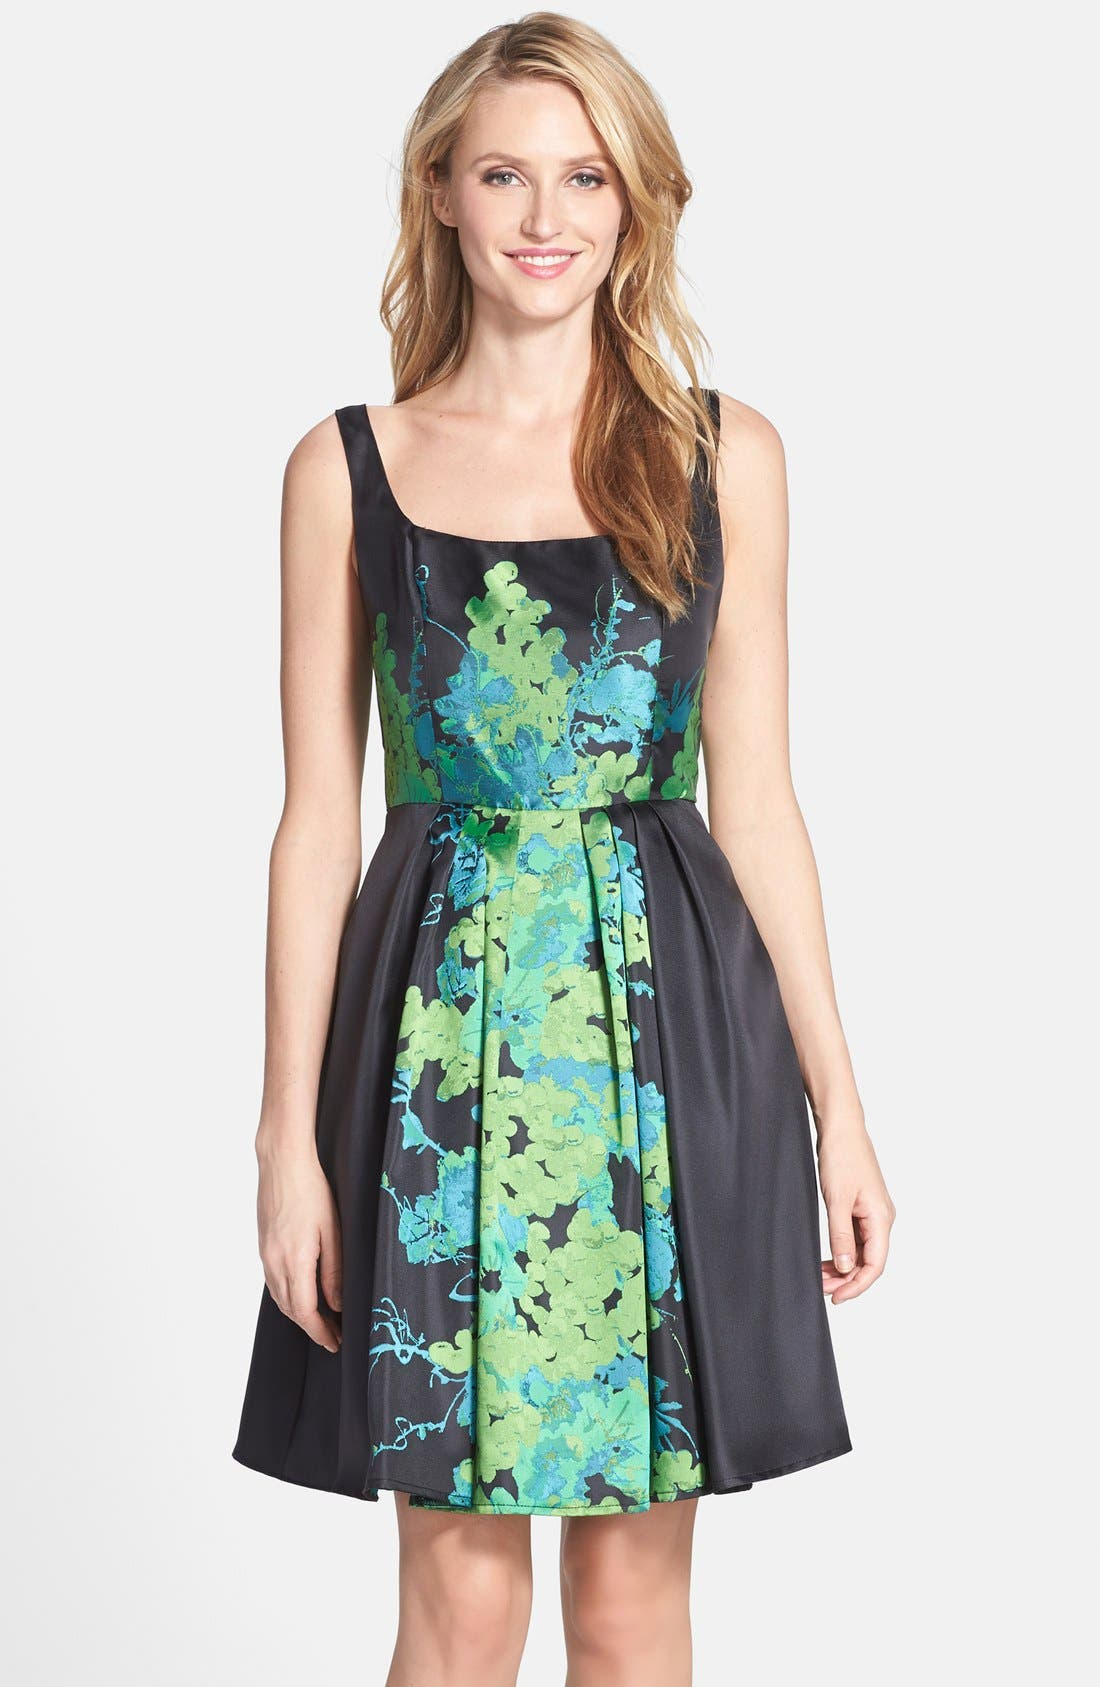 Alternate Image 1 Selected - Eva by Eva Franco 'Betty' Floral Print Fit & Flare Dress